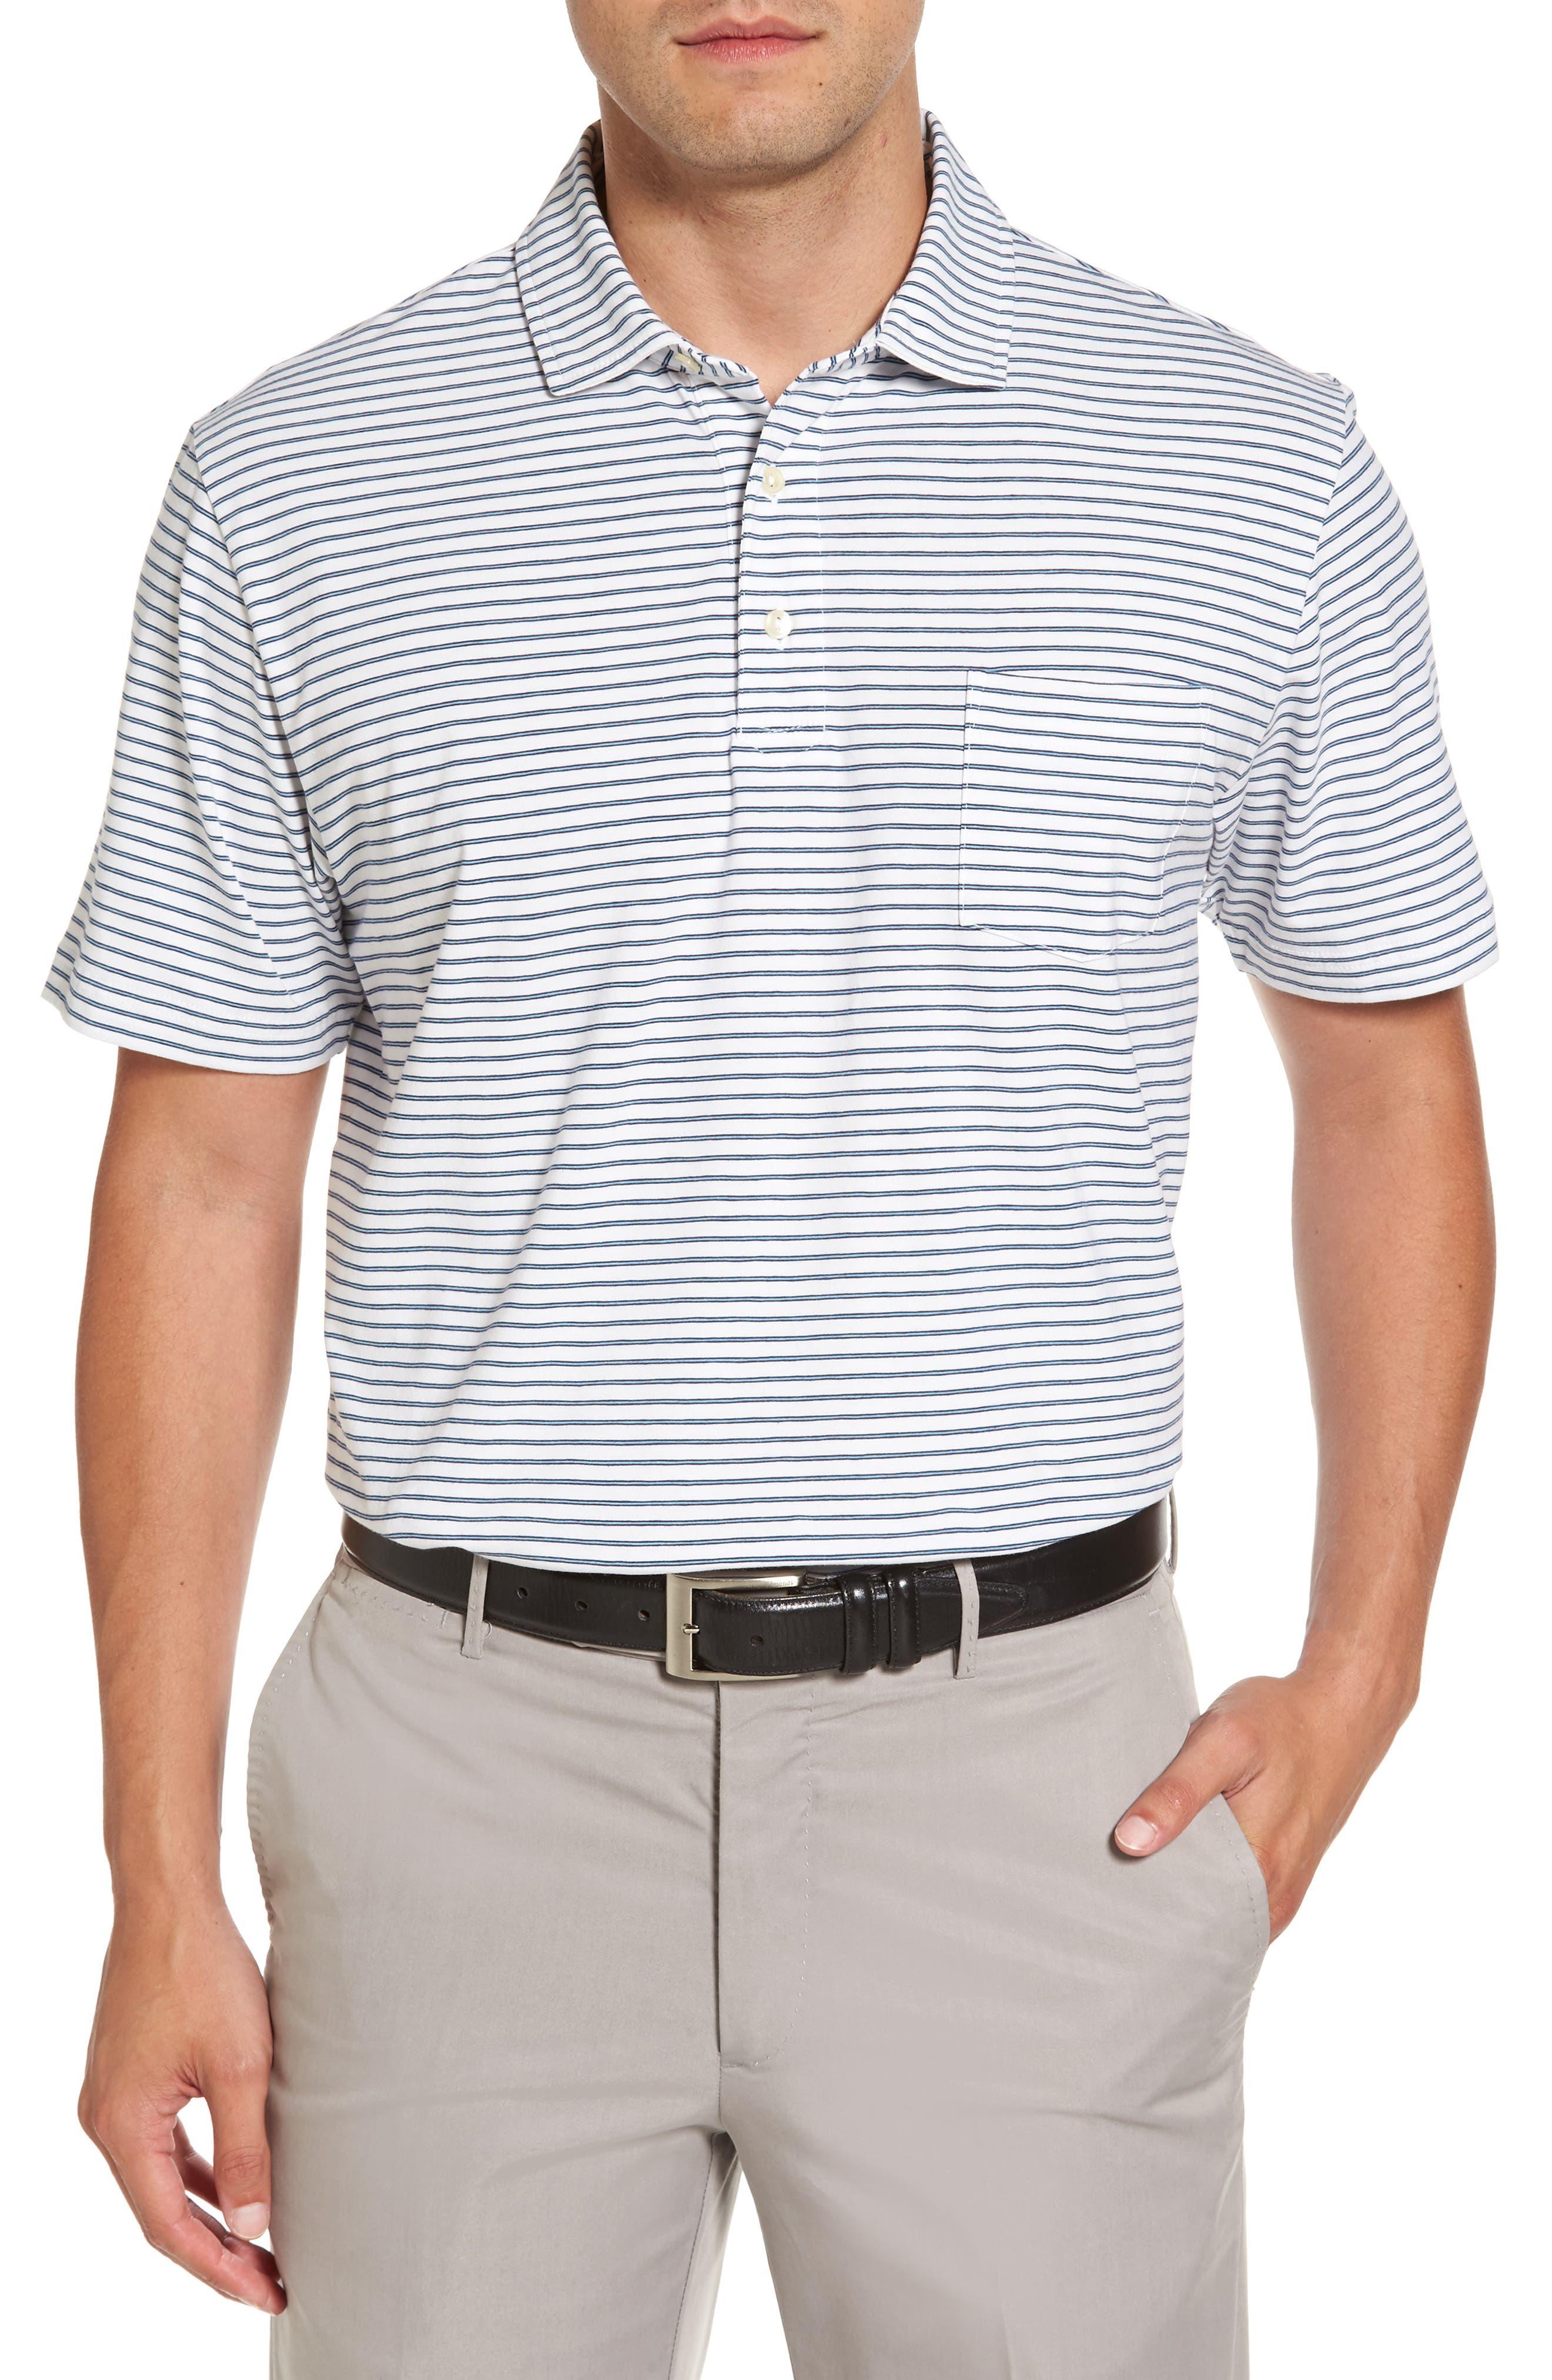 Stratton Mountainside Stripe Jersey Polo,                         Main,                         color, White